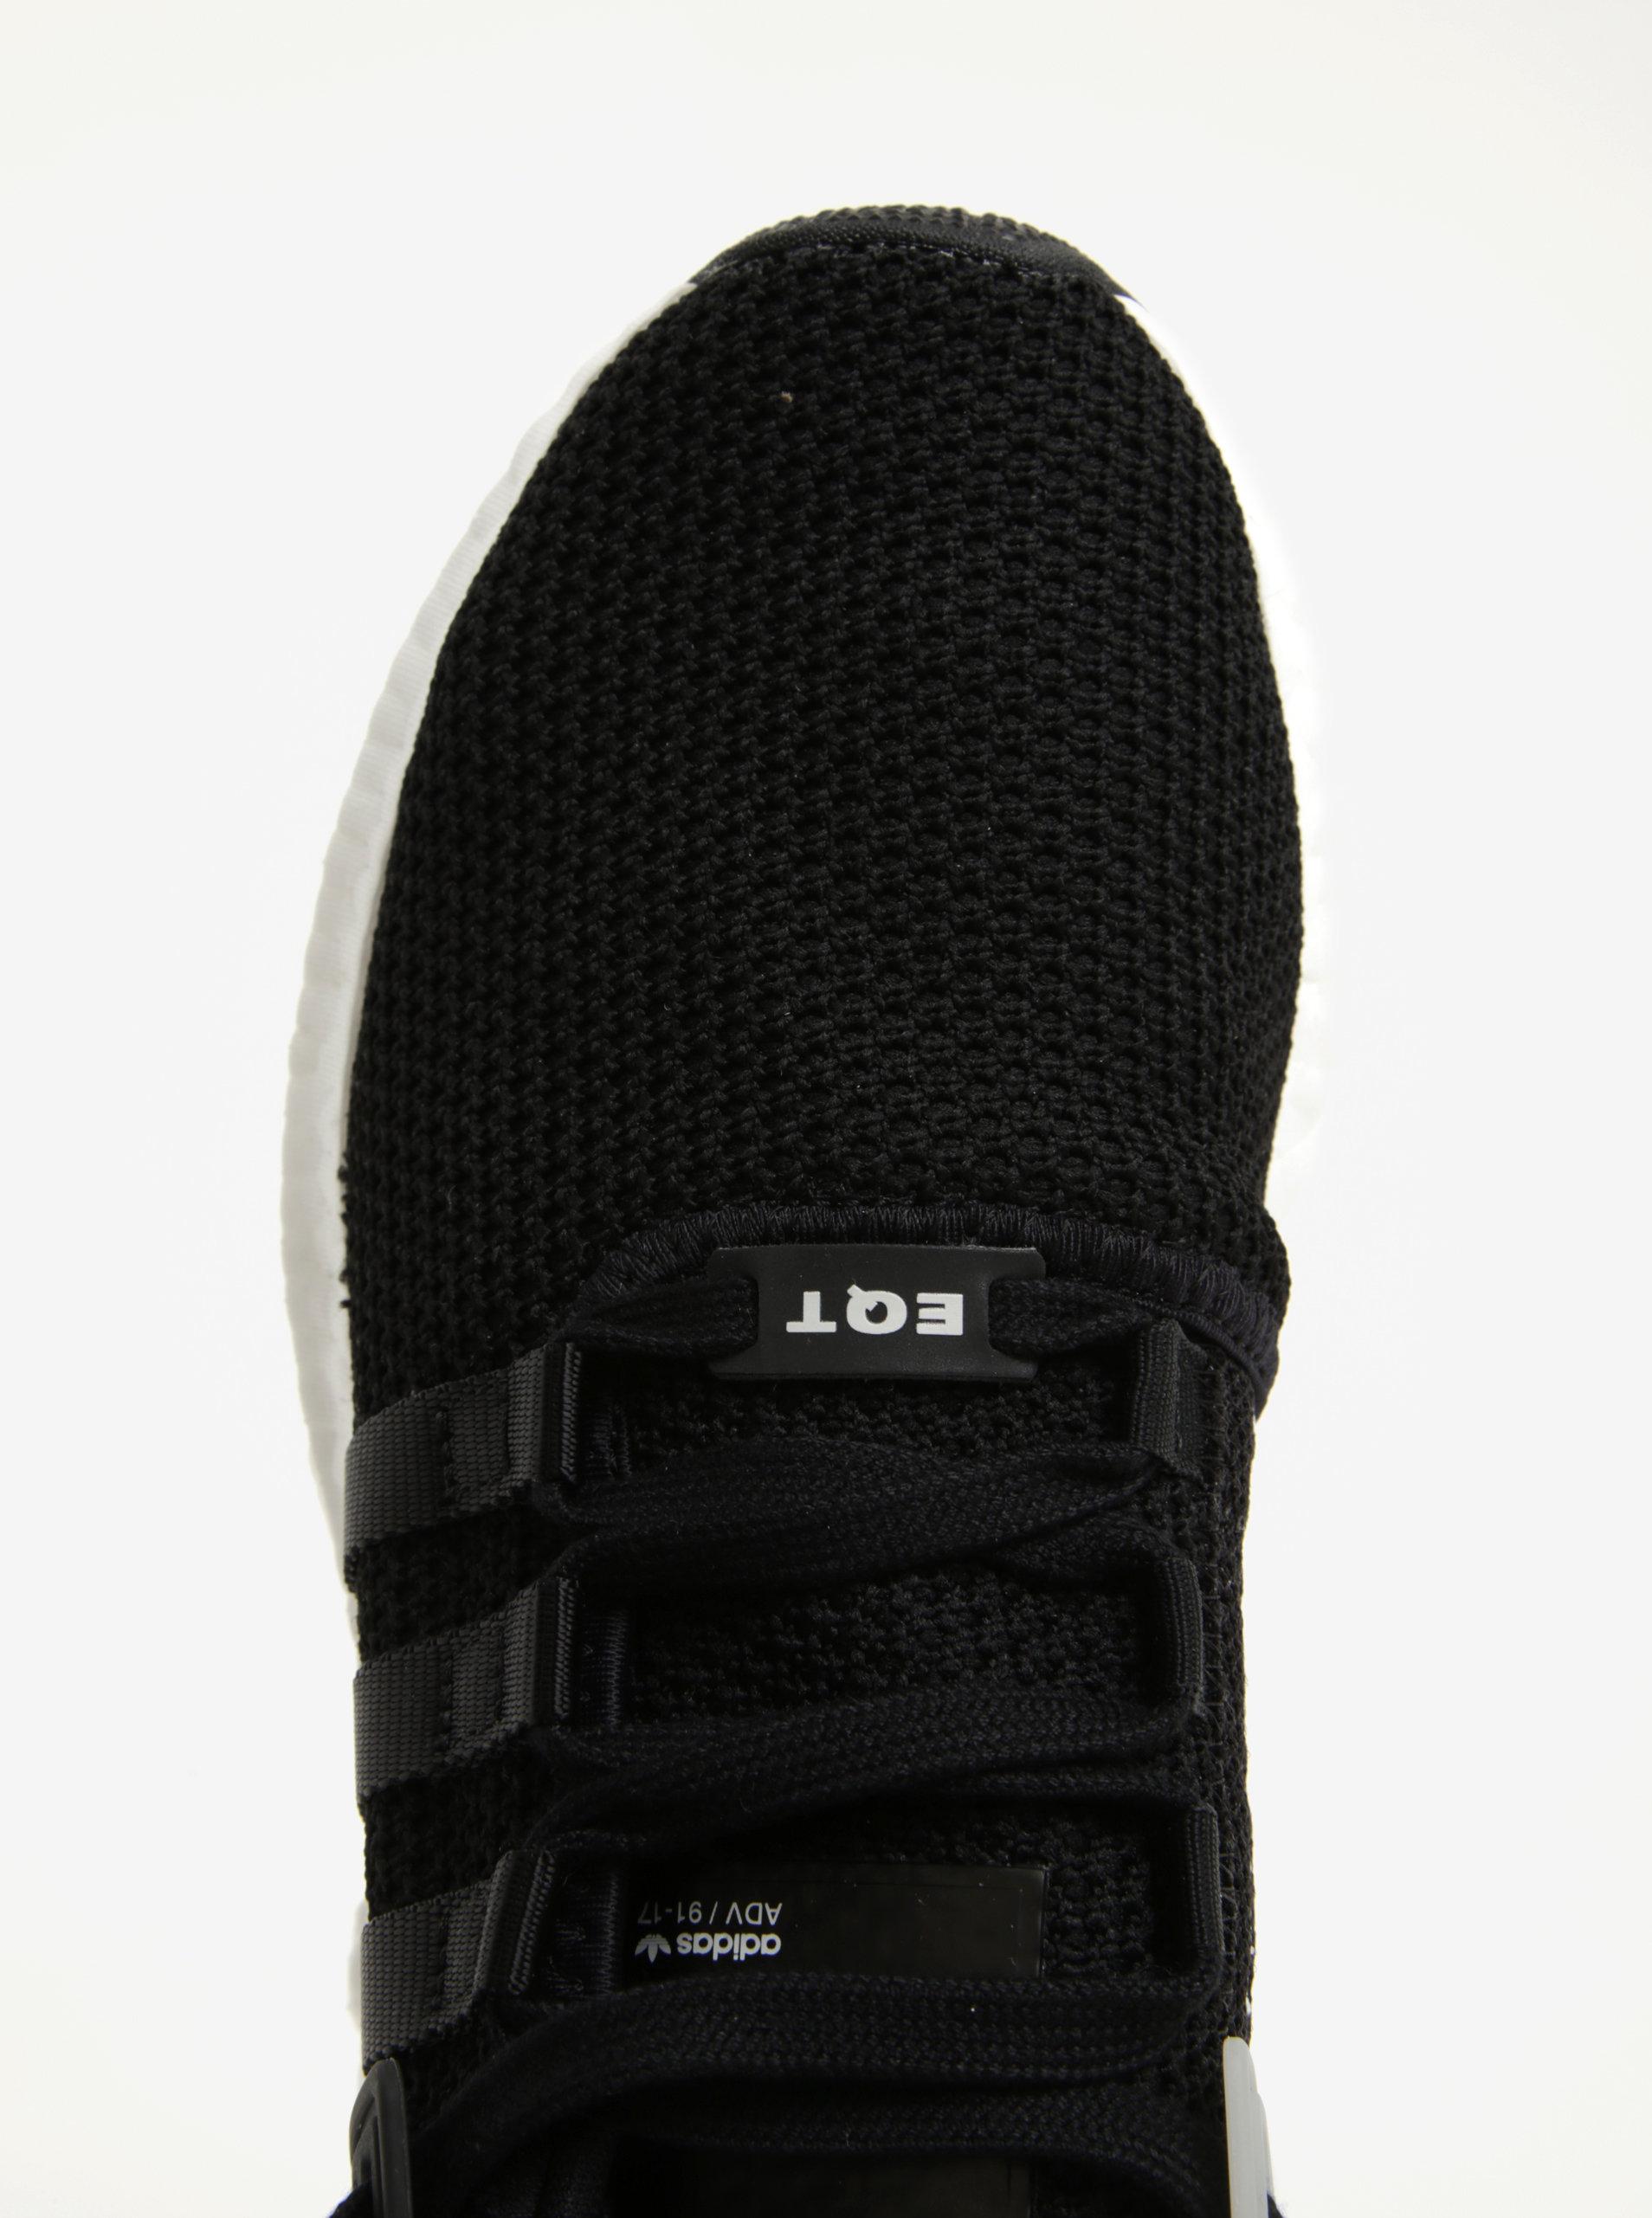 023a6fcf995d Čierne pánske tenisky s bielou podrážkou adidas Originals Eqt Support ...